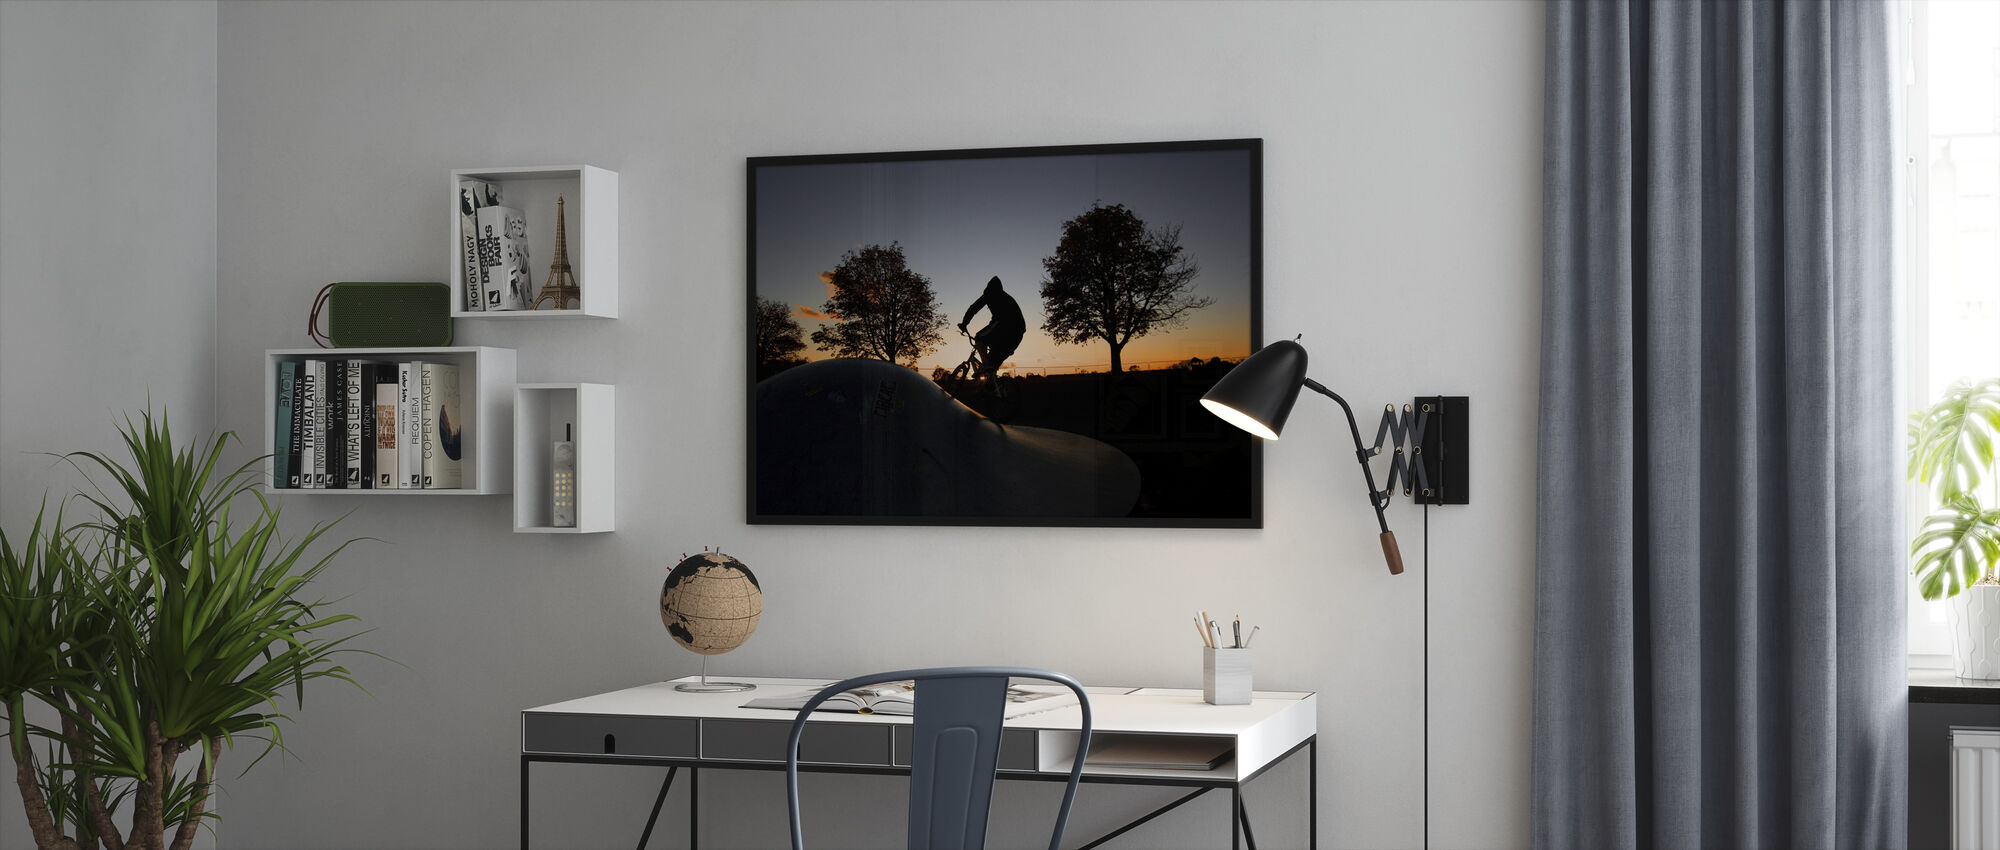 BMX Biking at Sunset - Framed print - Office